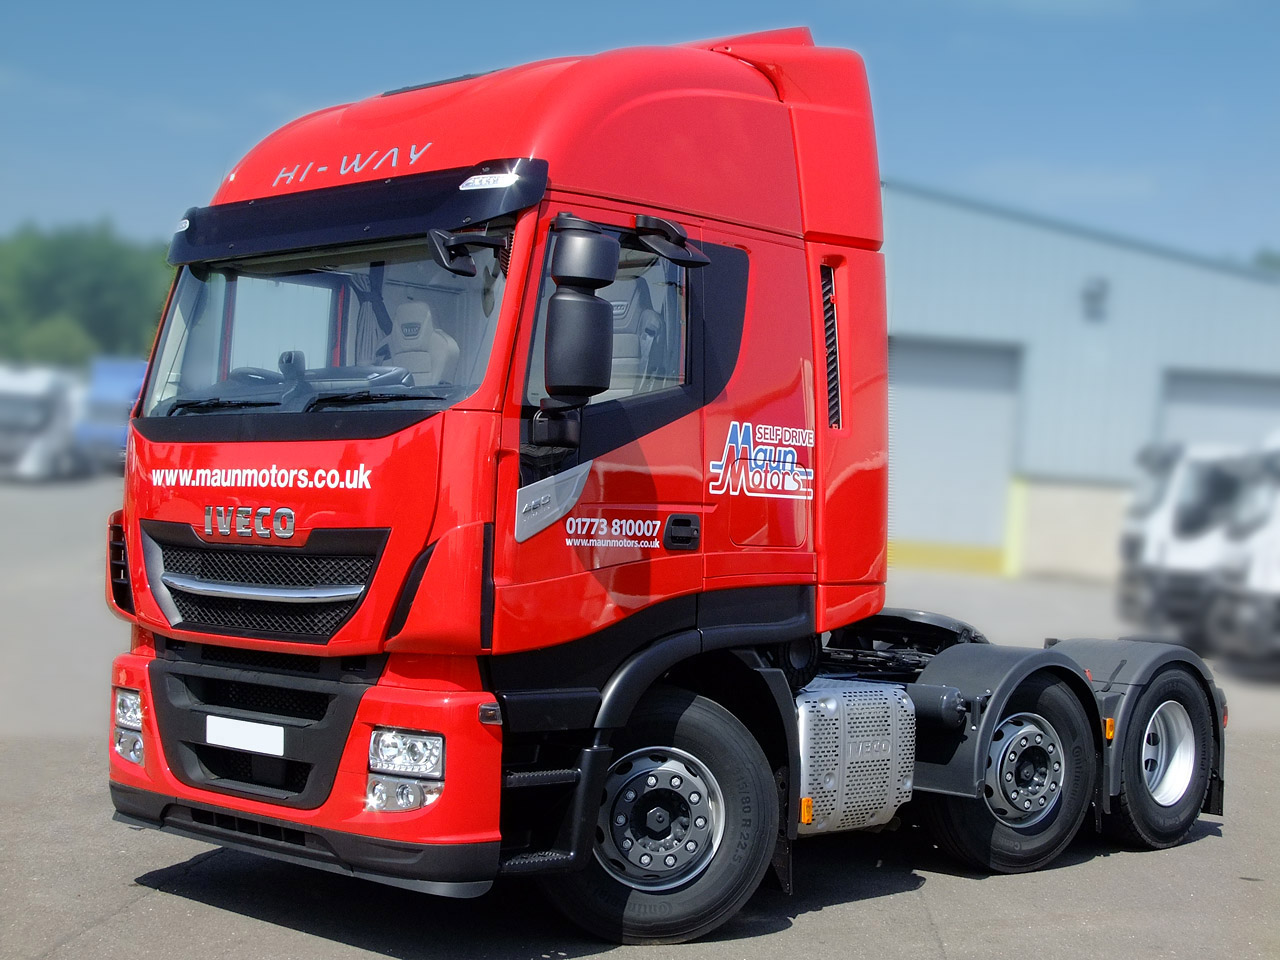 Tractor Unit, 6x2 - Euro 6 - e.g. Iveco Stralis HI-WAY